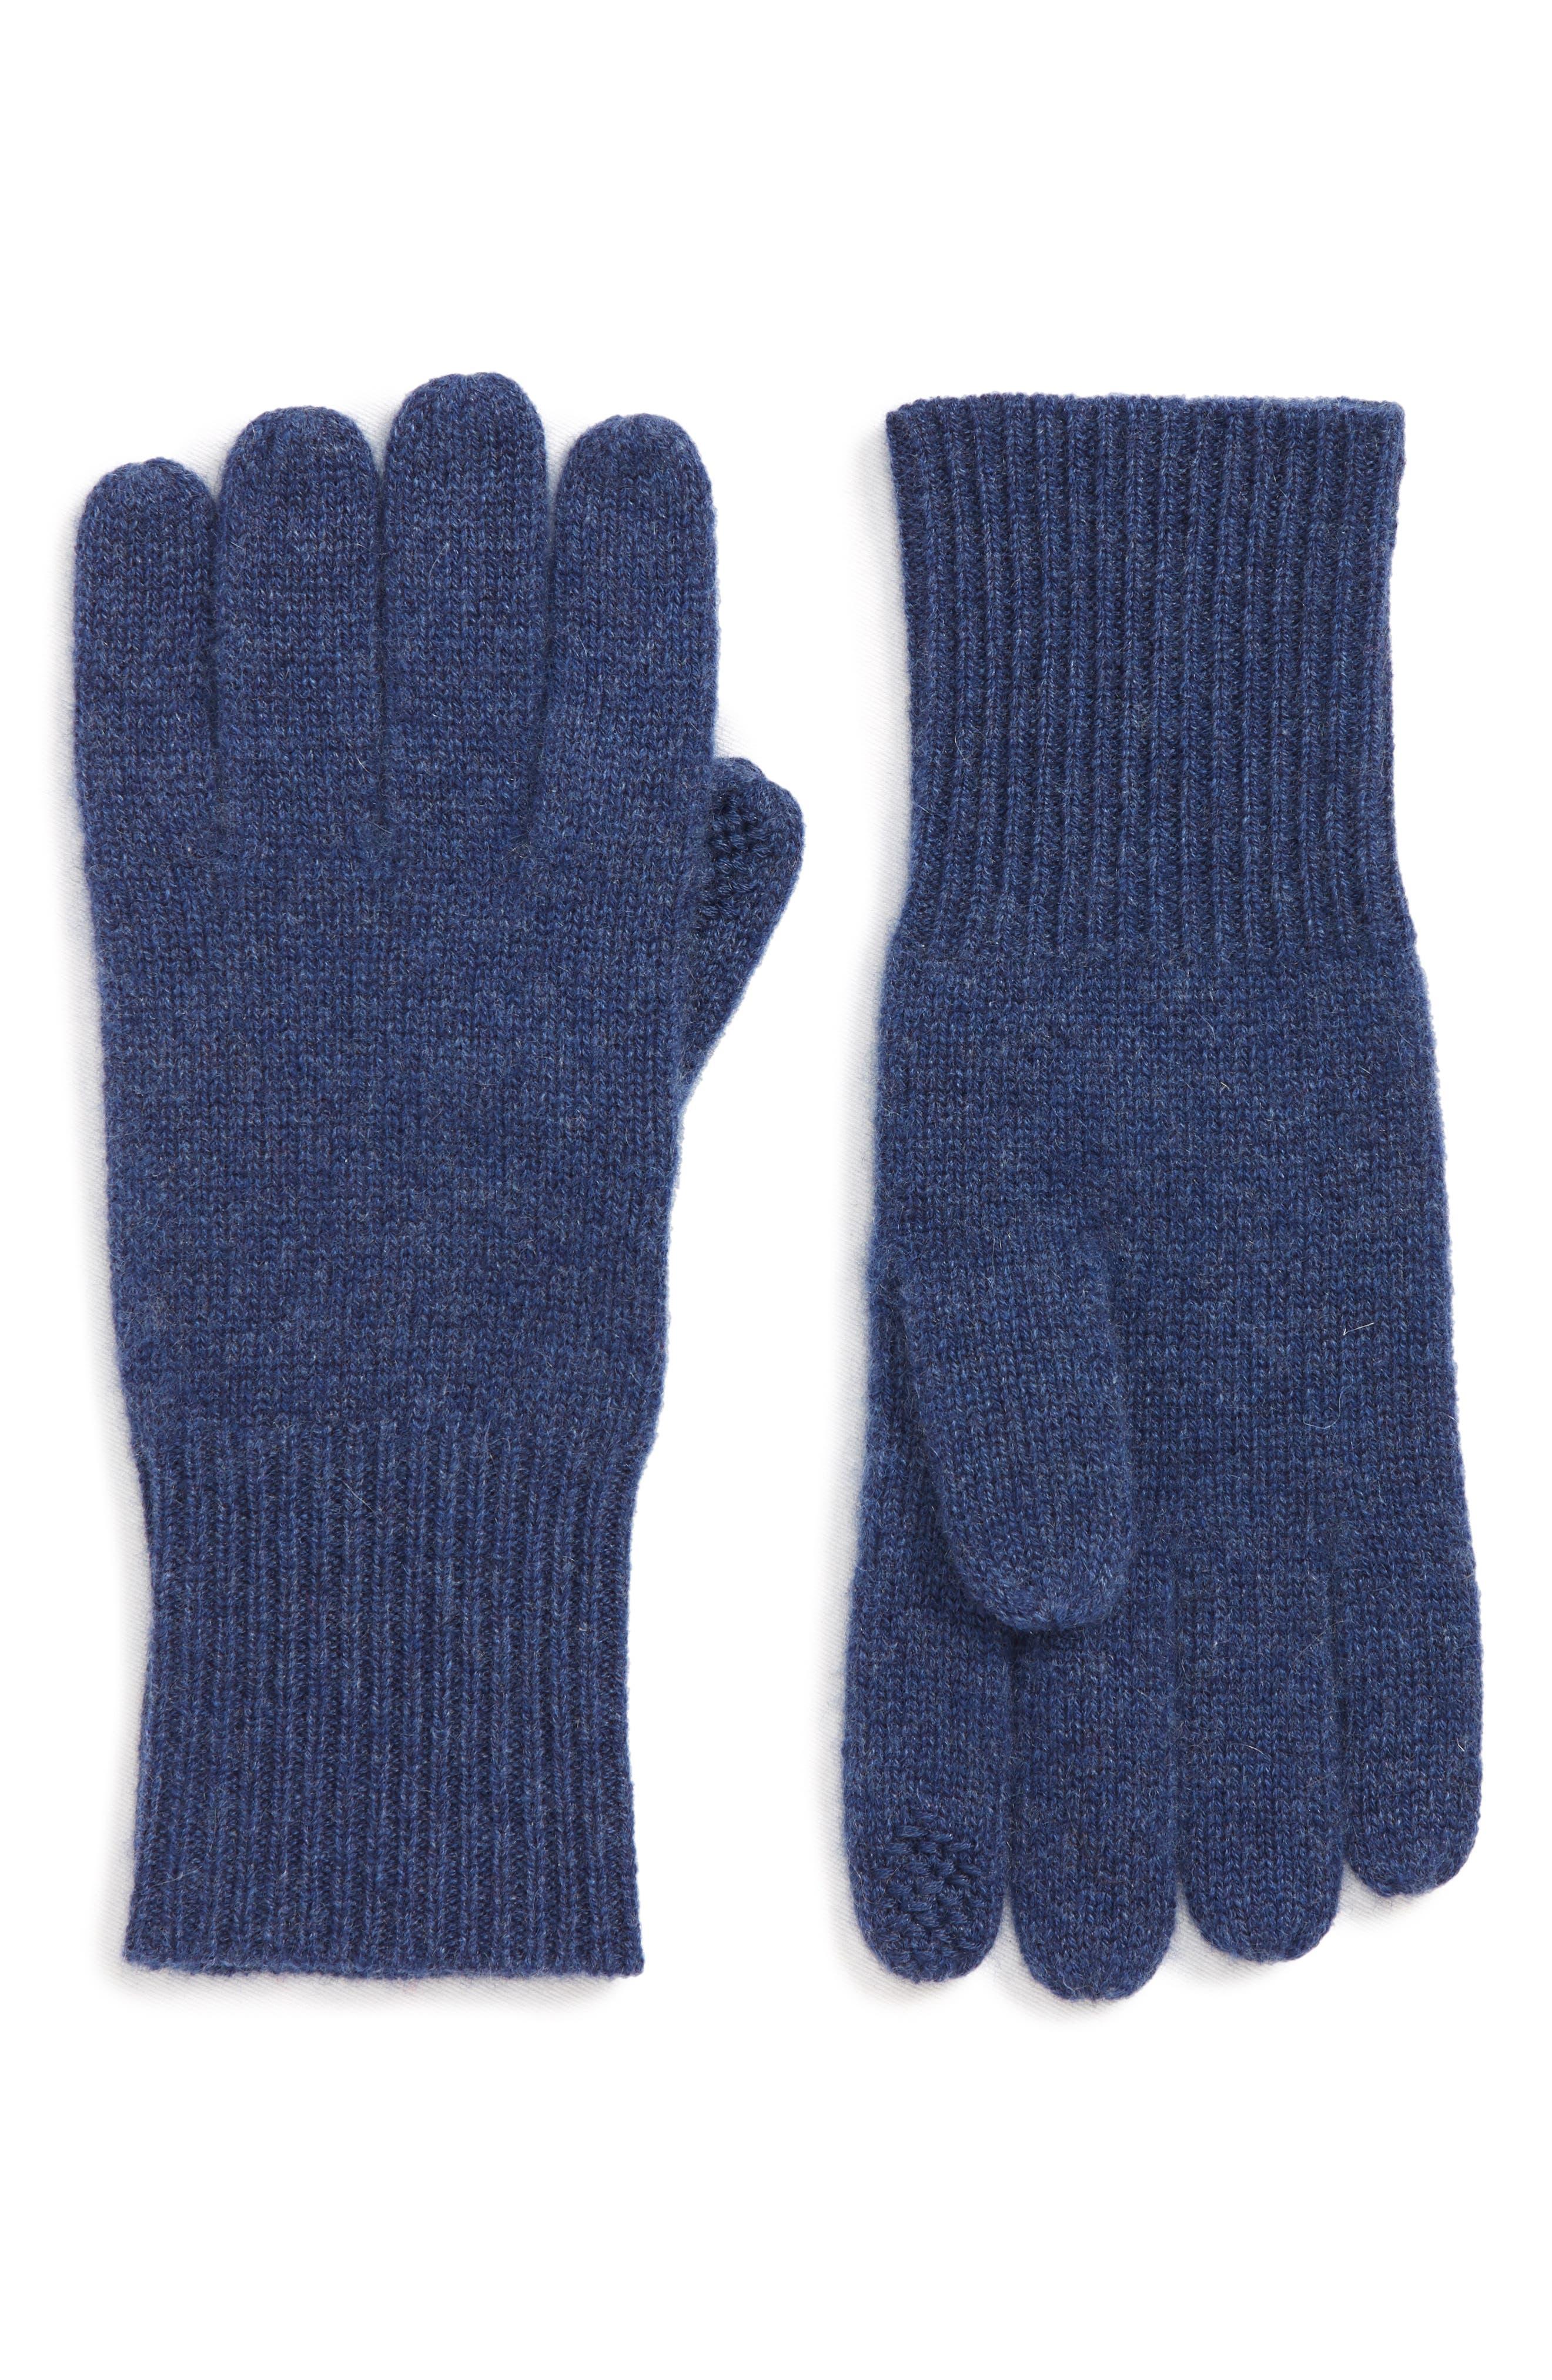 Rib Knit Cashmere Gloves,                         Main,                         color, BLUE CAPTAIN HEATHER